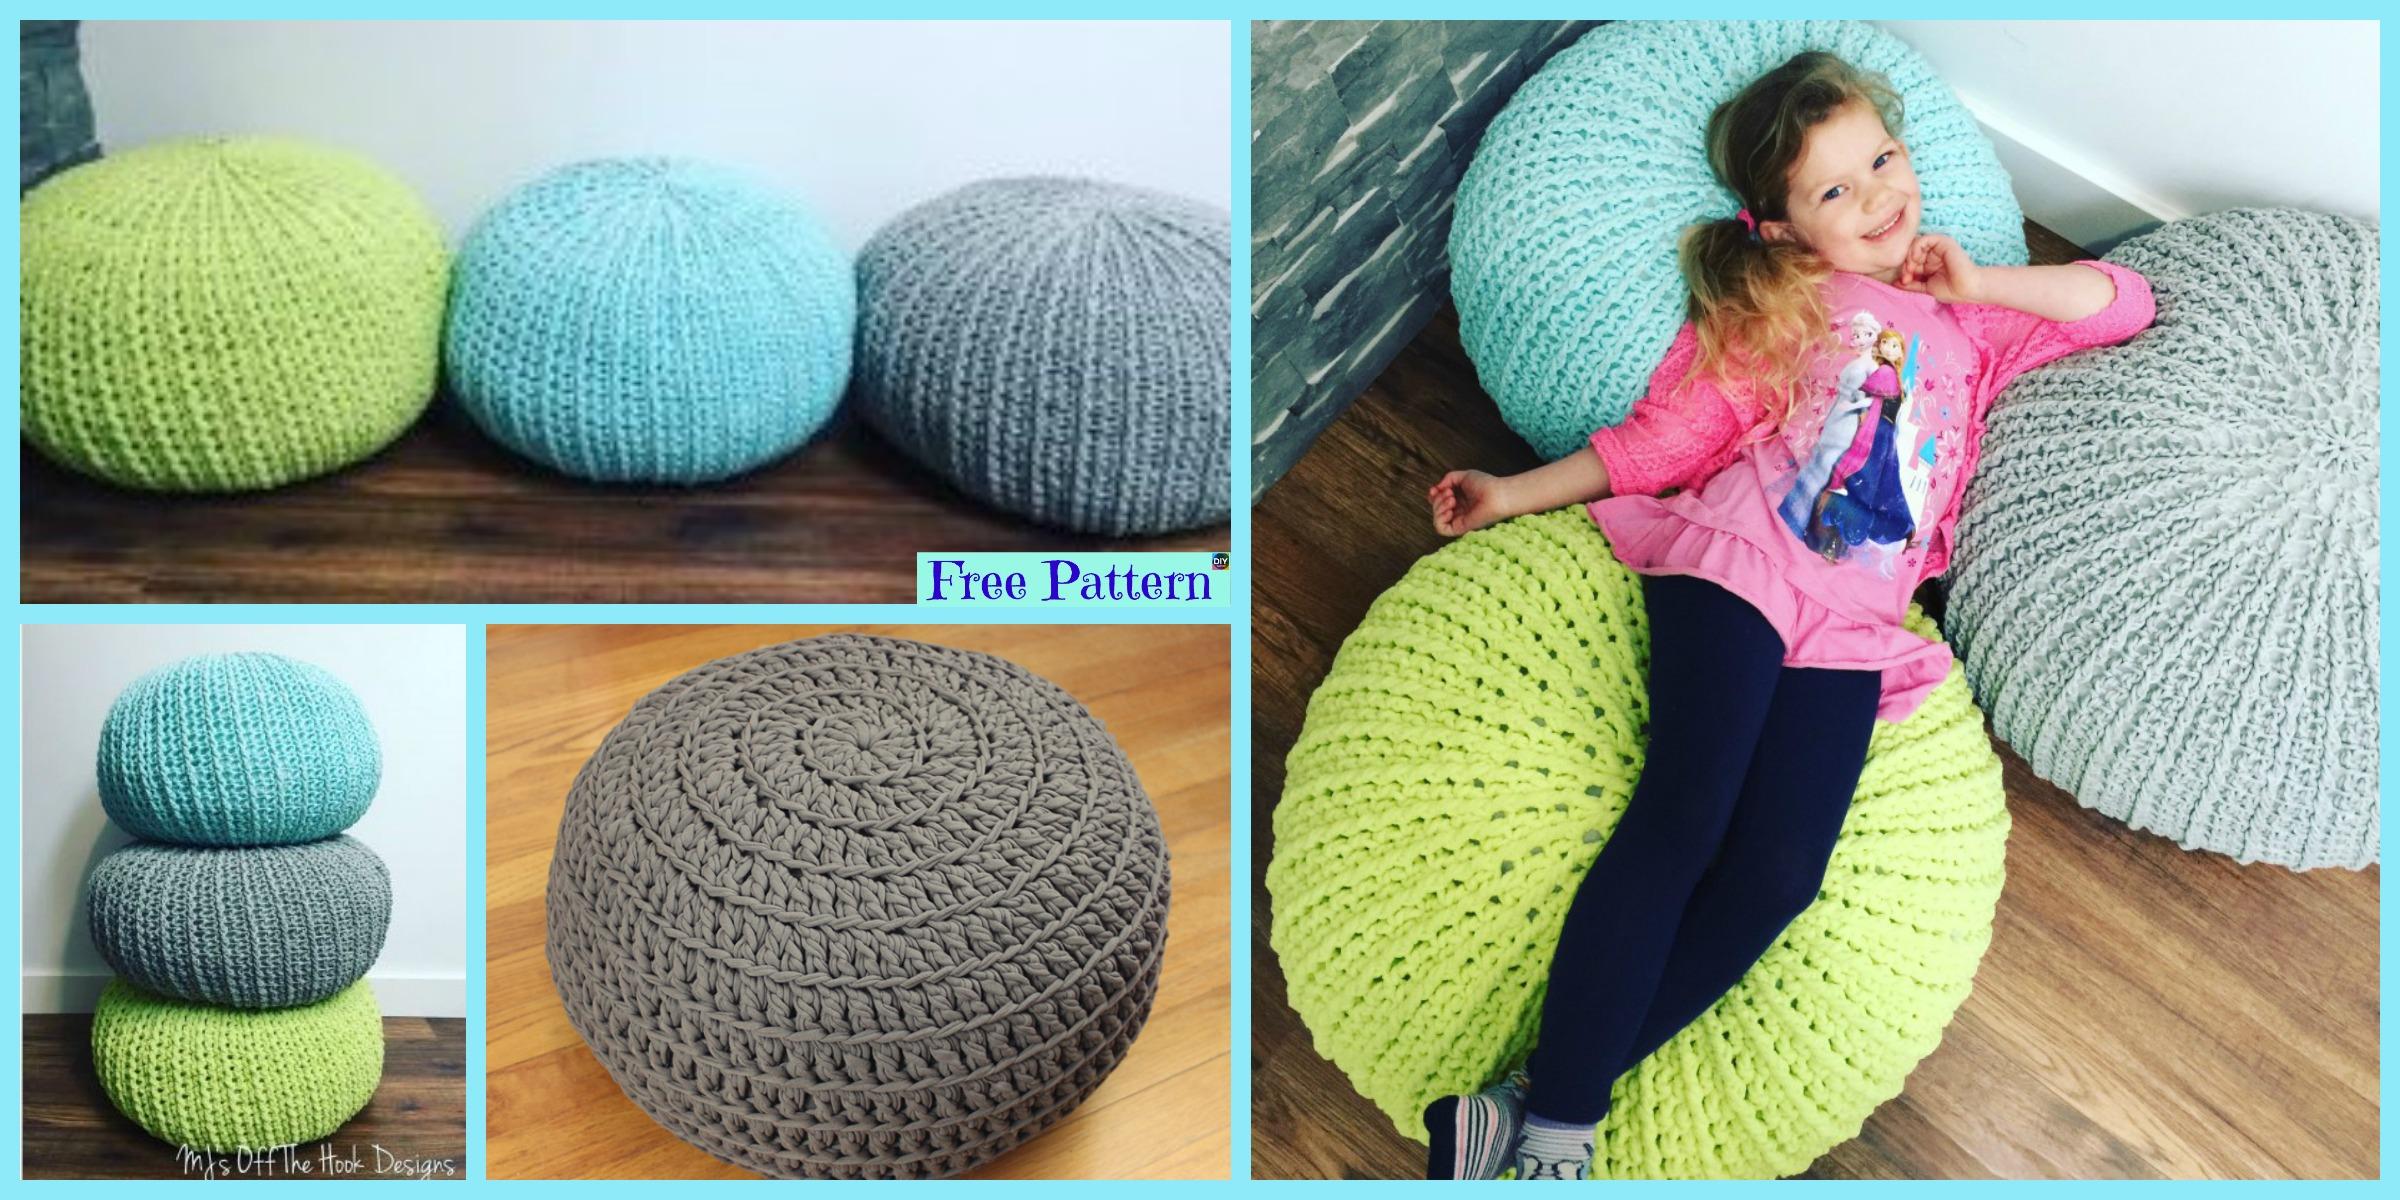 diy4ever- Cozy Crochet Floor Pouf - Free Pattern